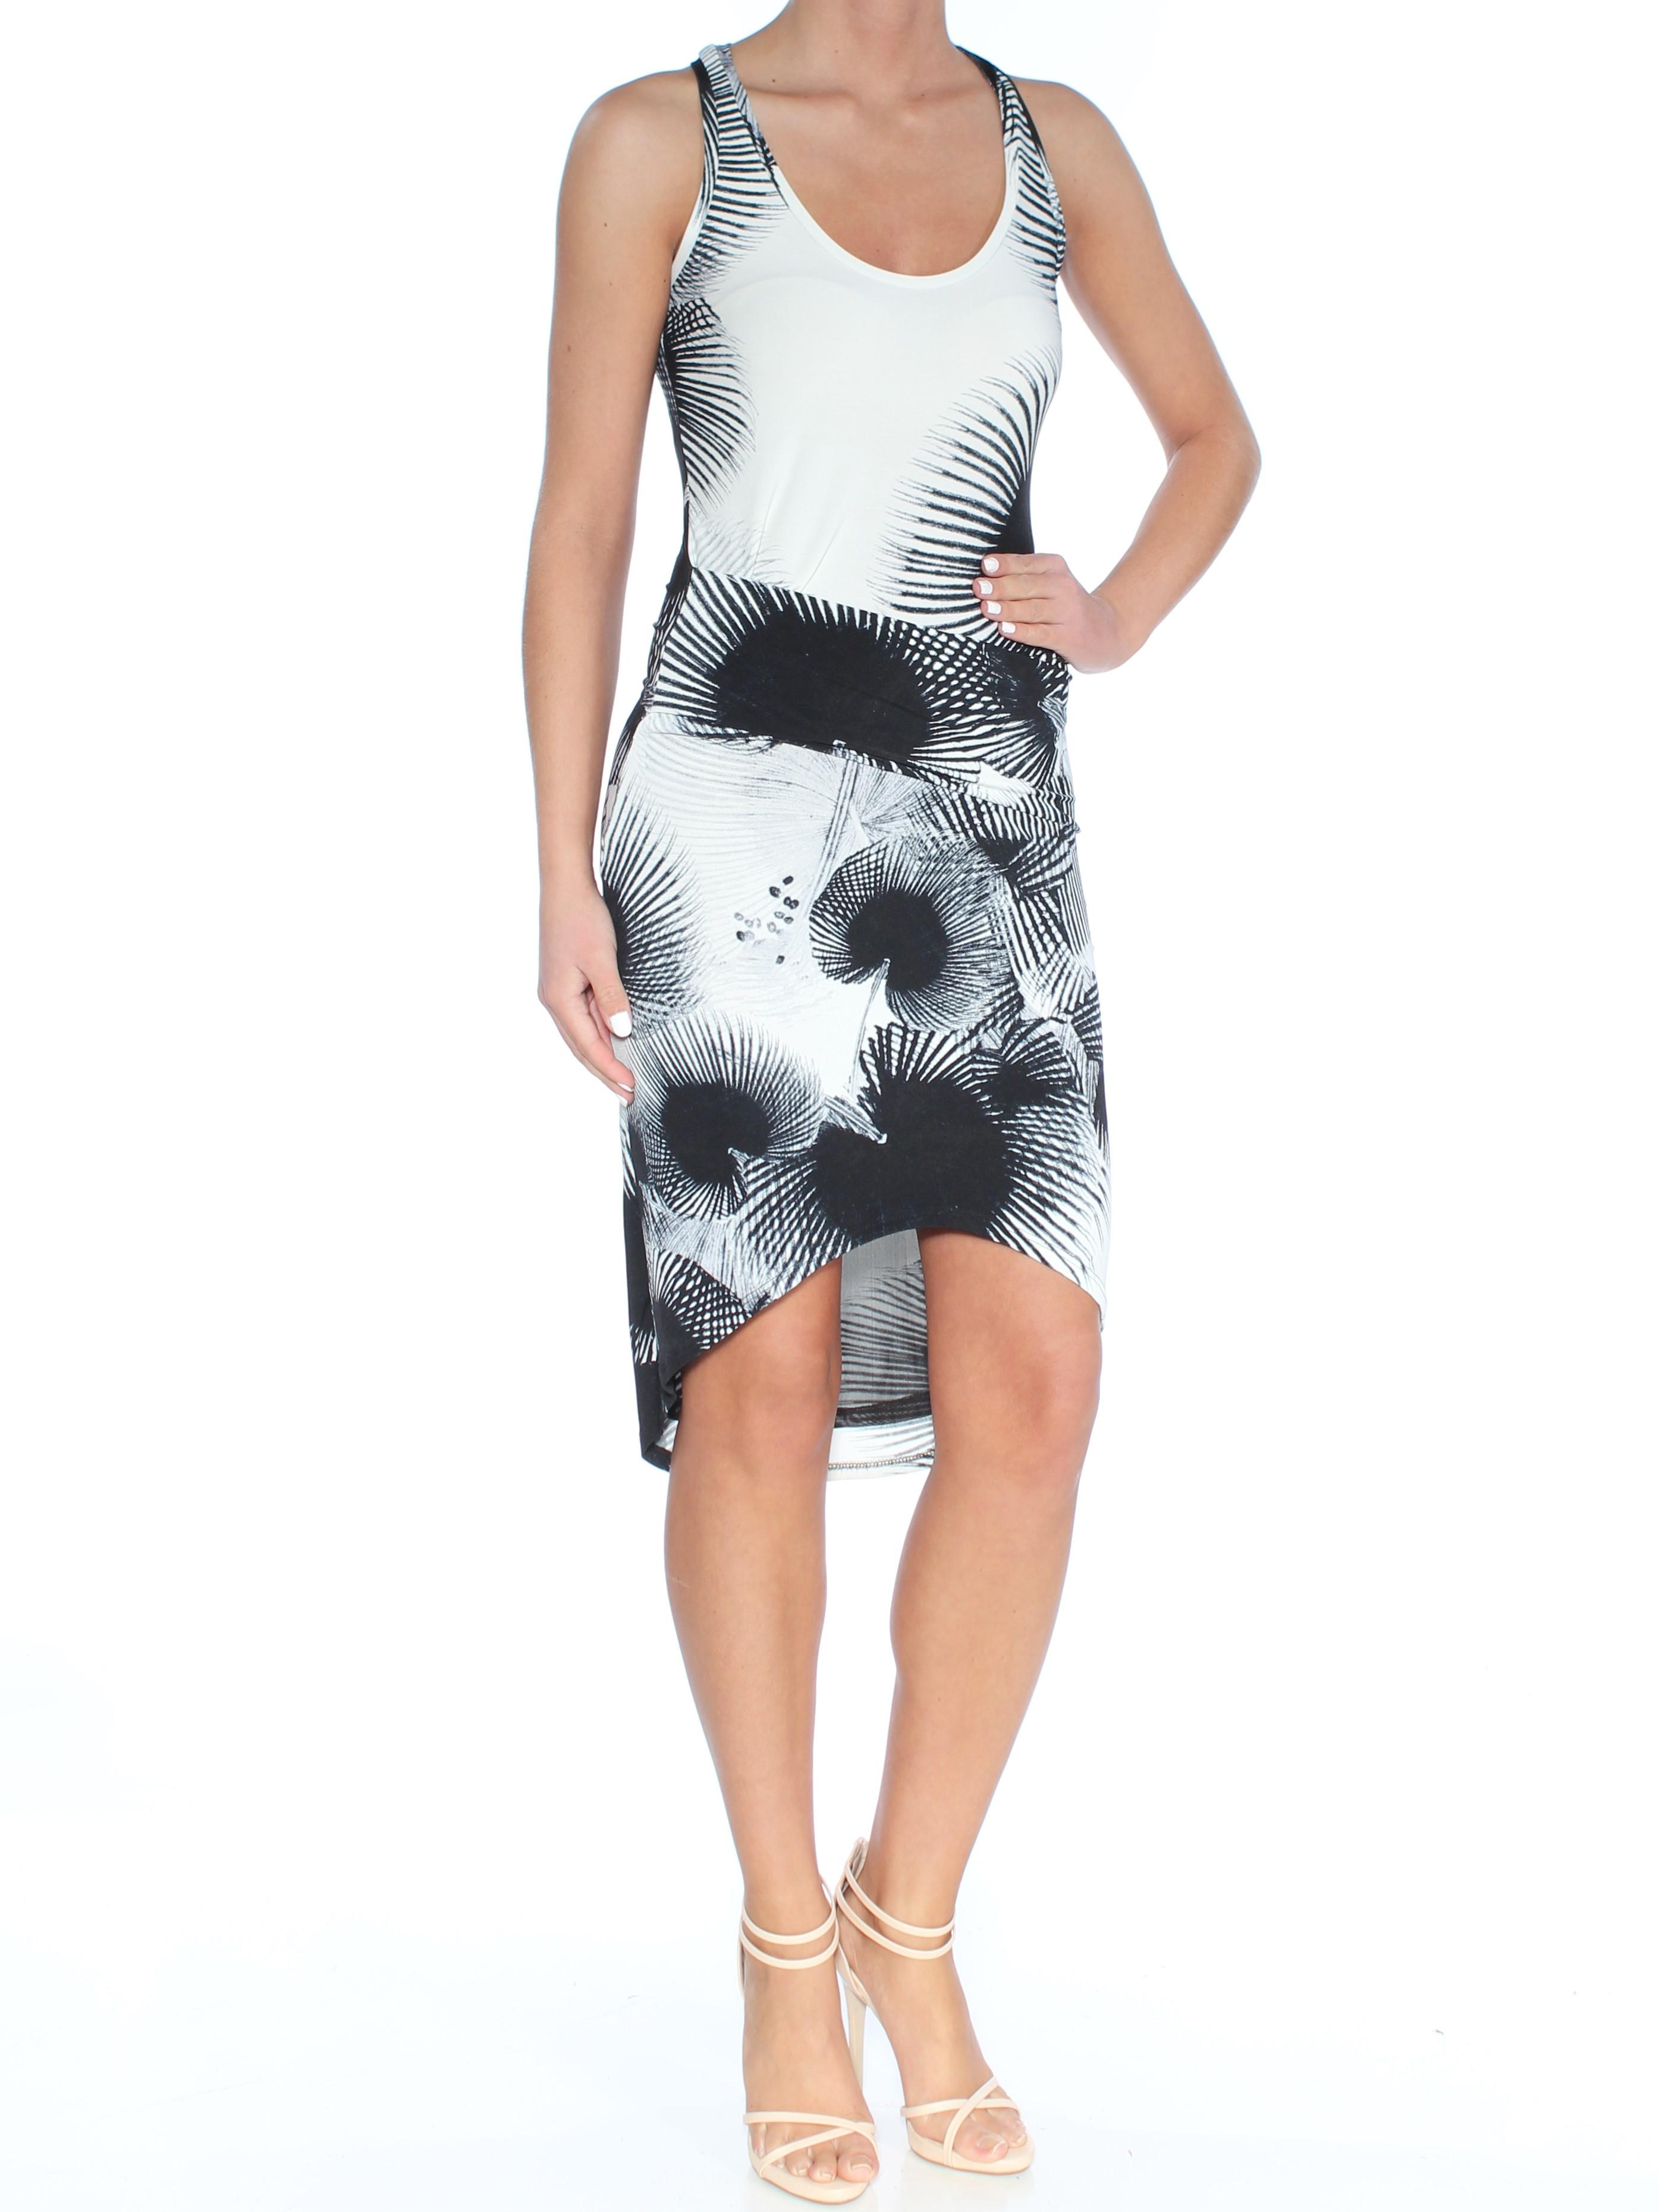 96134d99a60 RACHEL ROY  99 Womens New 1457 Black Printed Hi-lo Body Con Dress XS ...